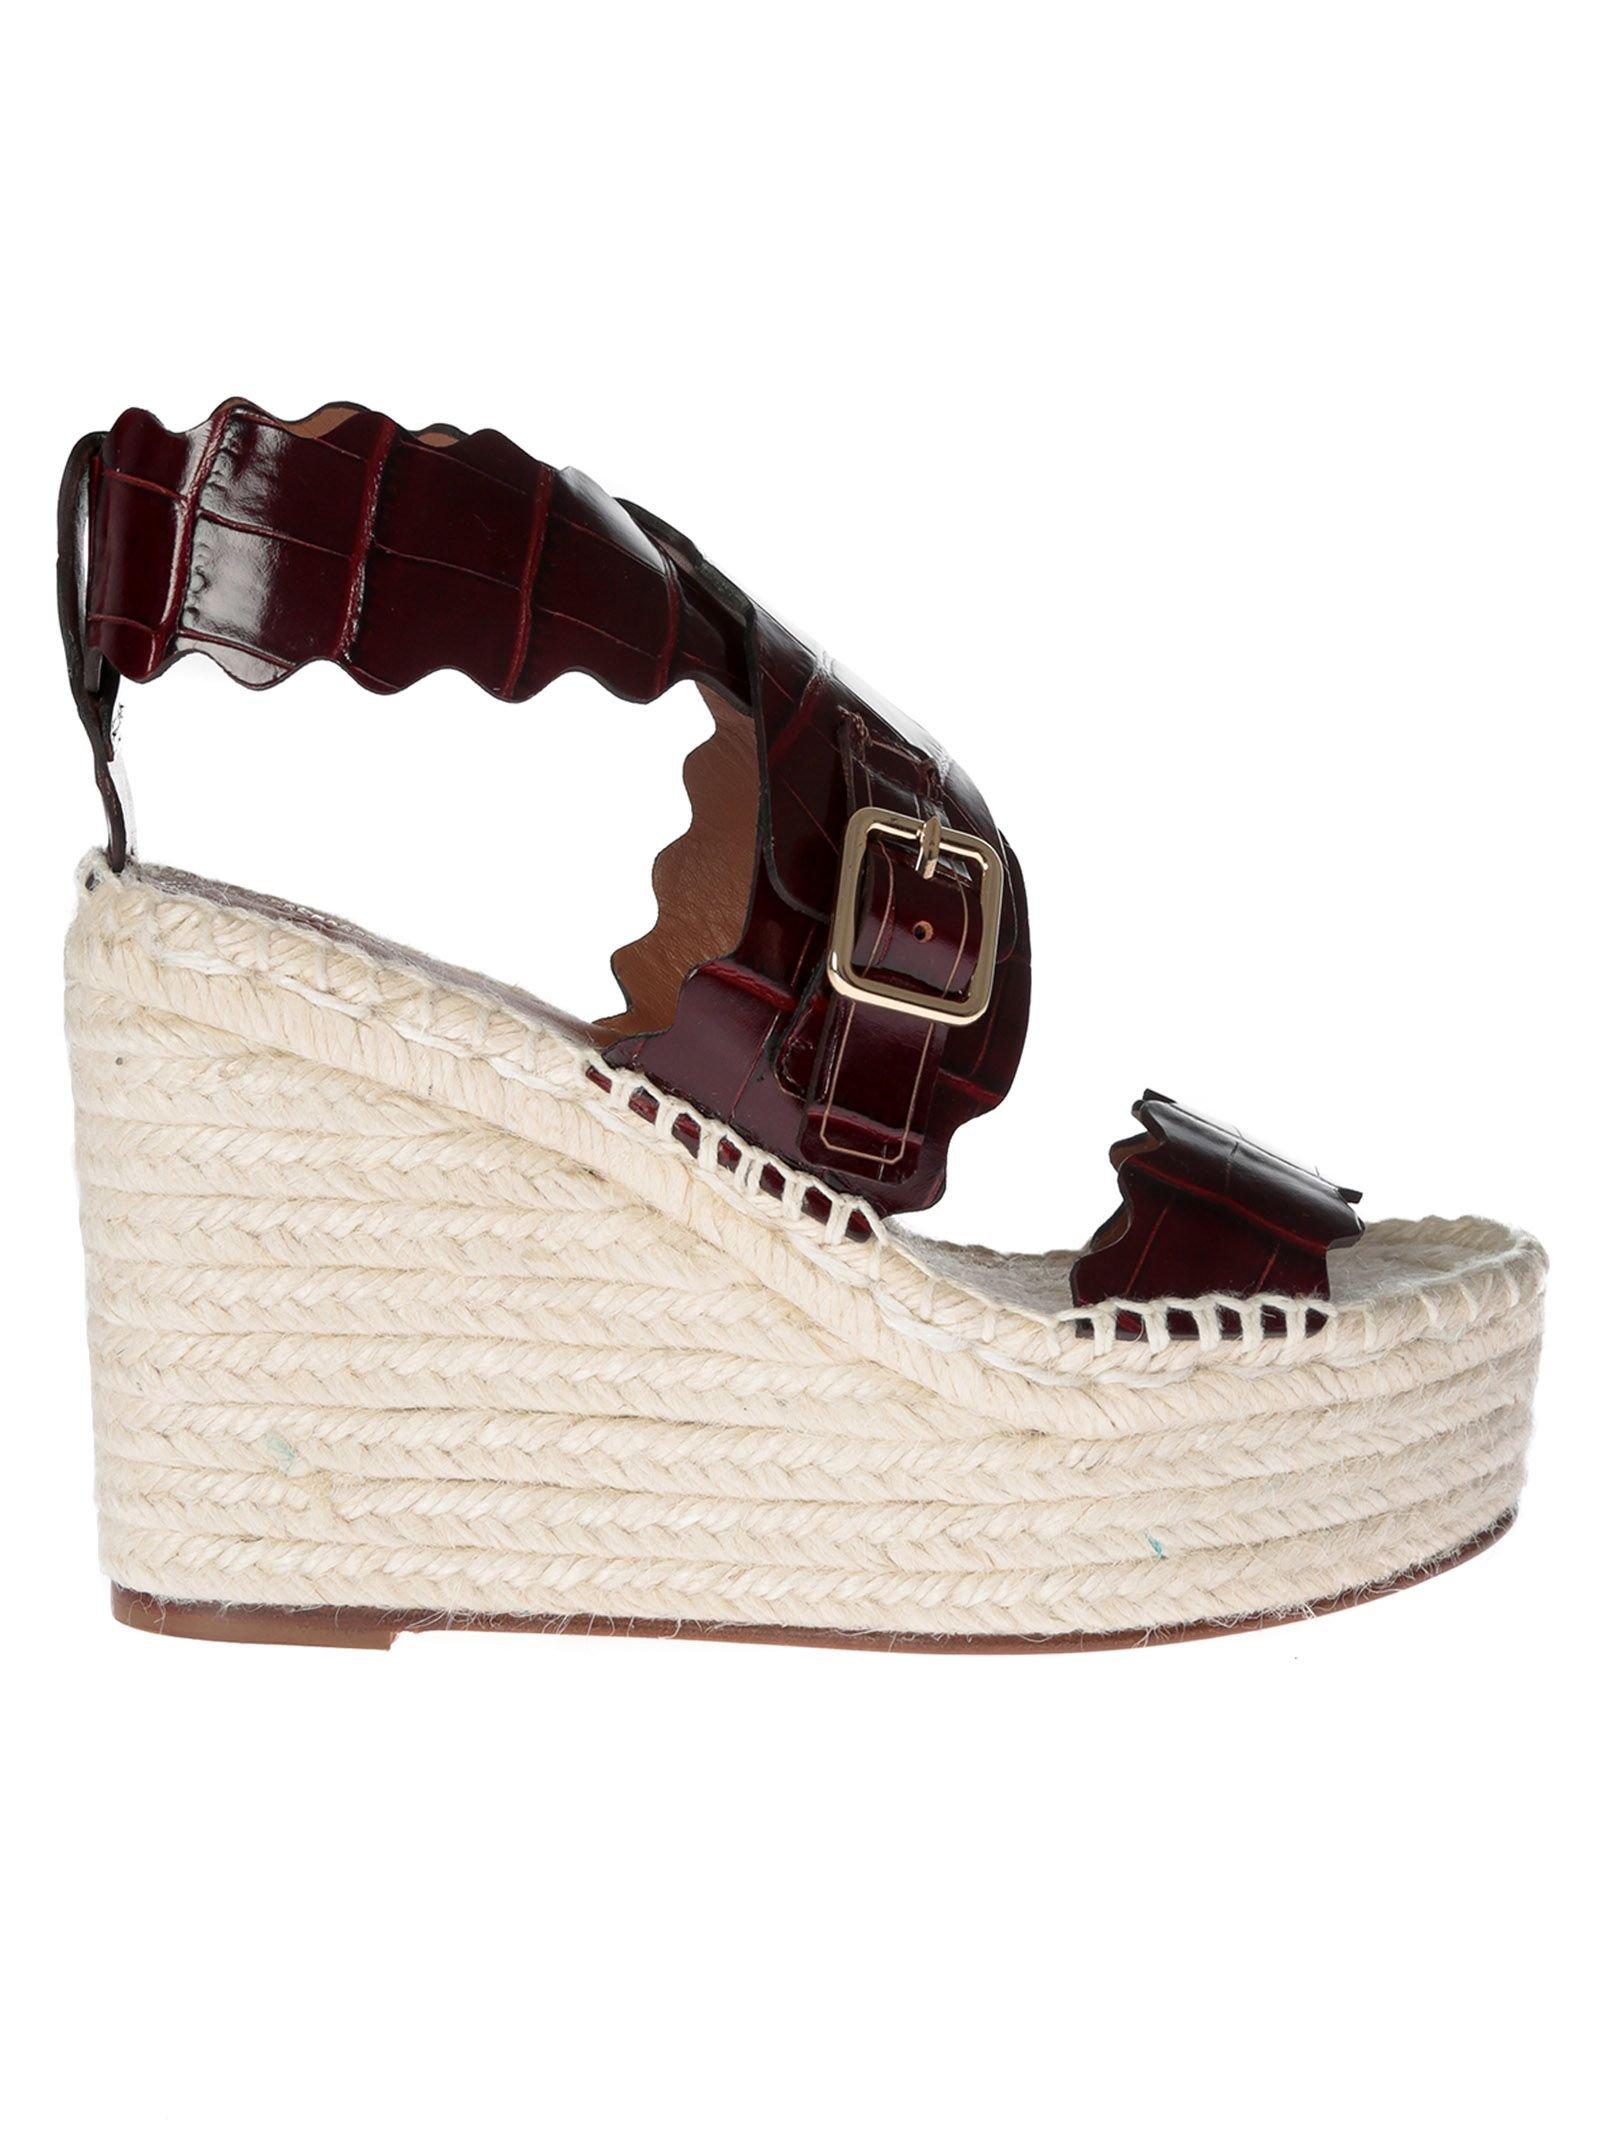 Chloé Embossed Wedge Sandals